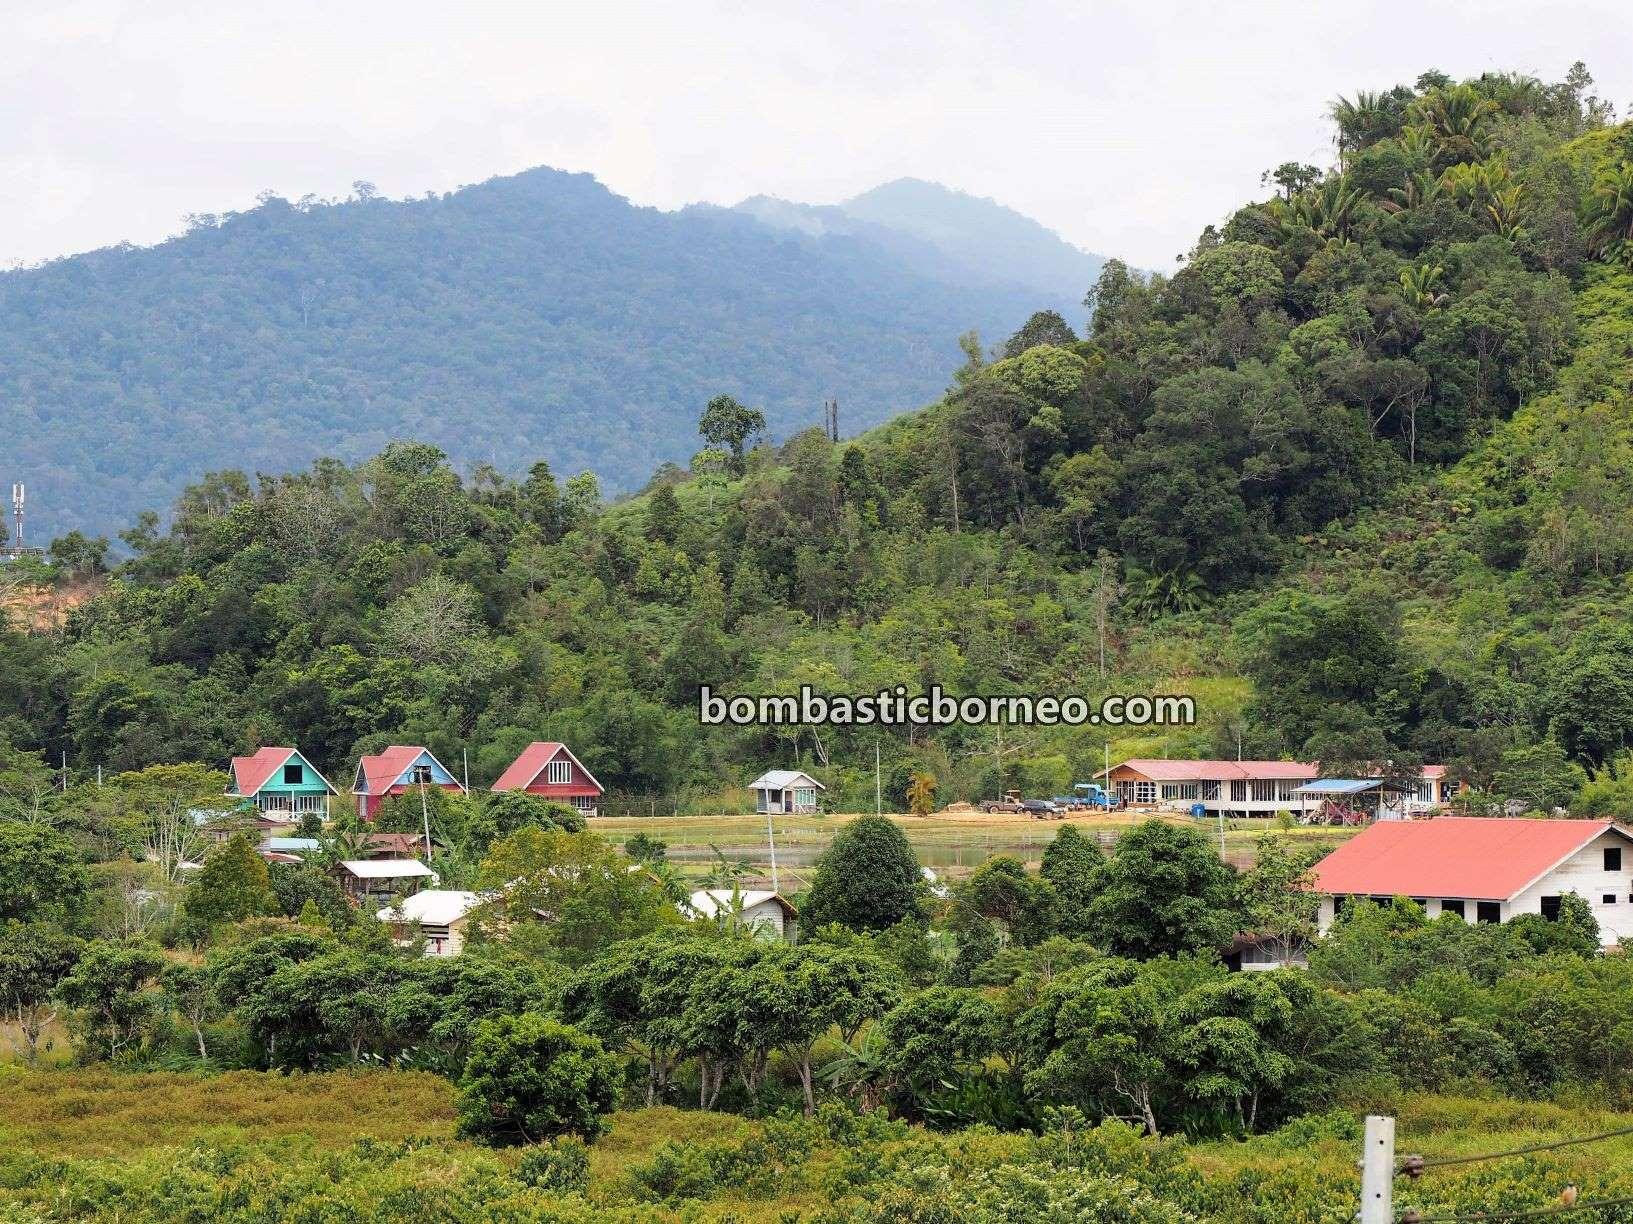 Kelabit Highlands, adventure, traditional, destination, exploration, homestay, tribe, Malaysia, Tourism, travel guide, Cross Border, Borneo, 穿越婆罗洲马来西亚, 砂拉越巴里奥高原, 原住民土著部落,